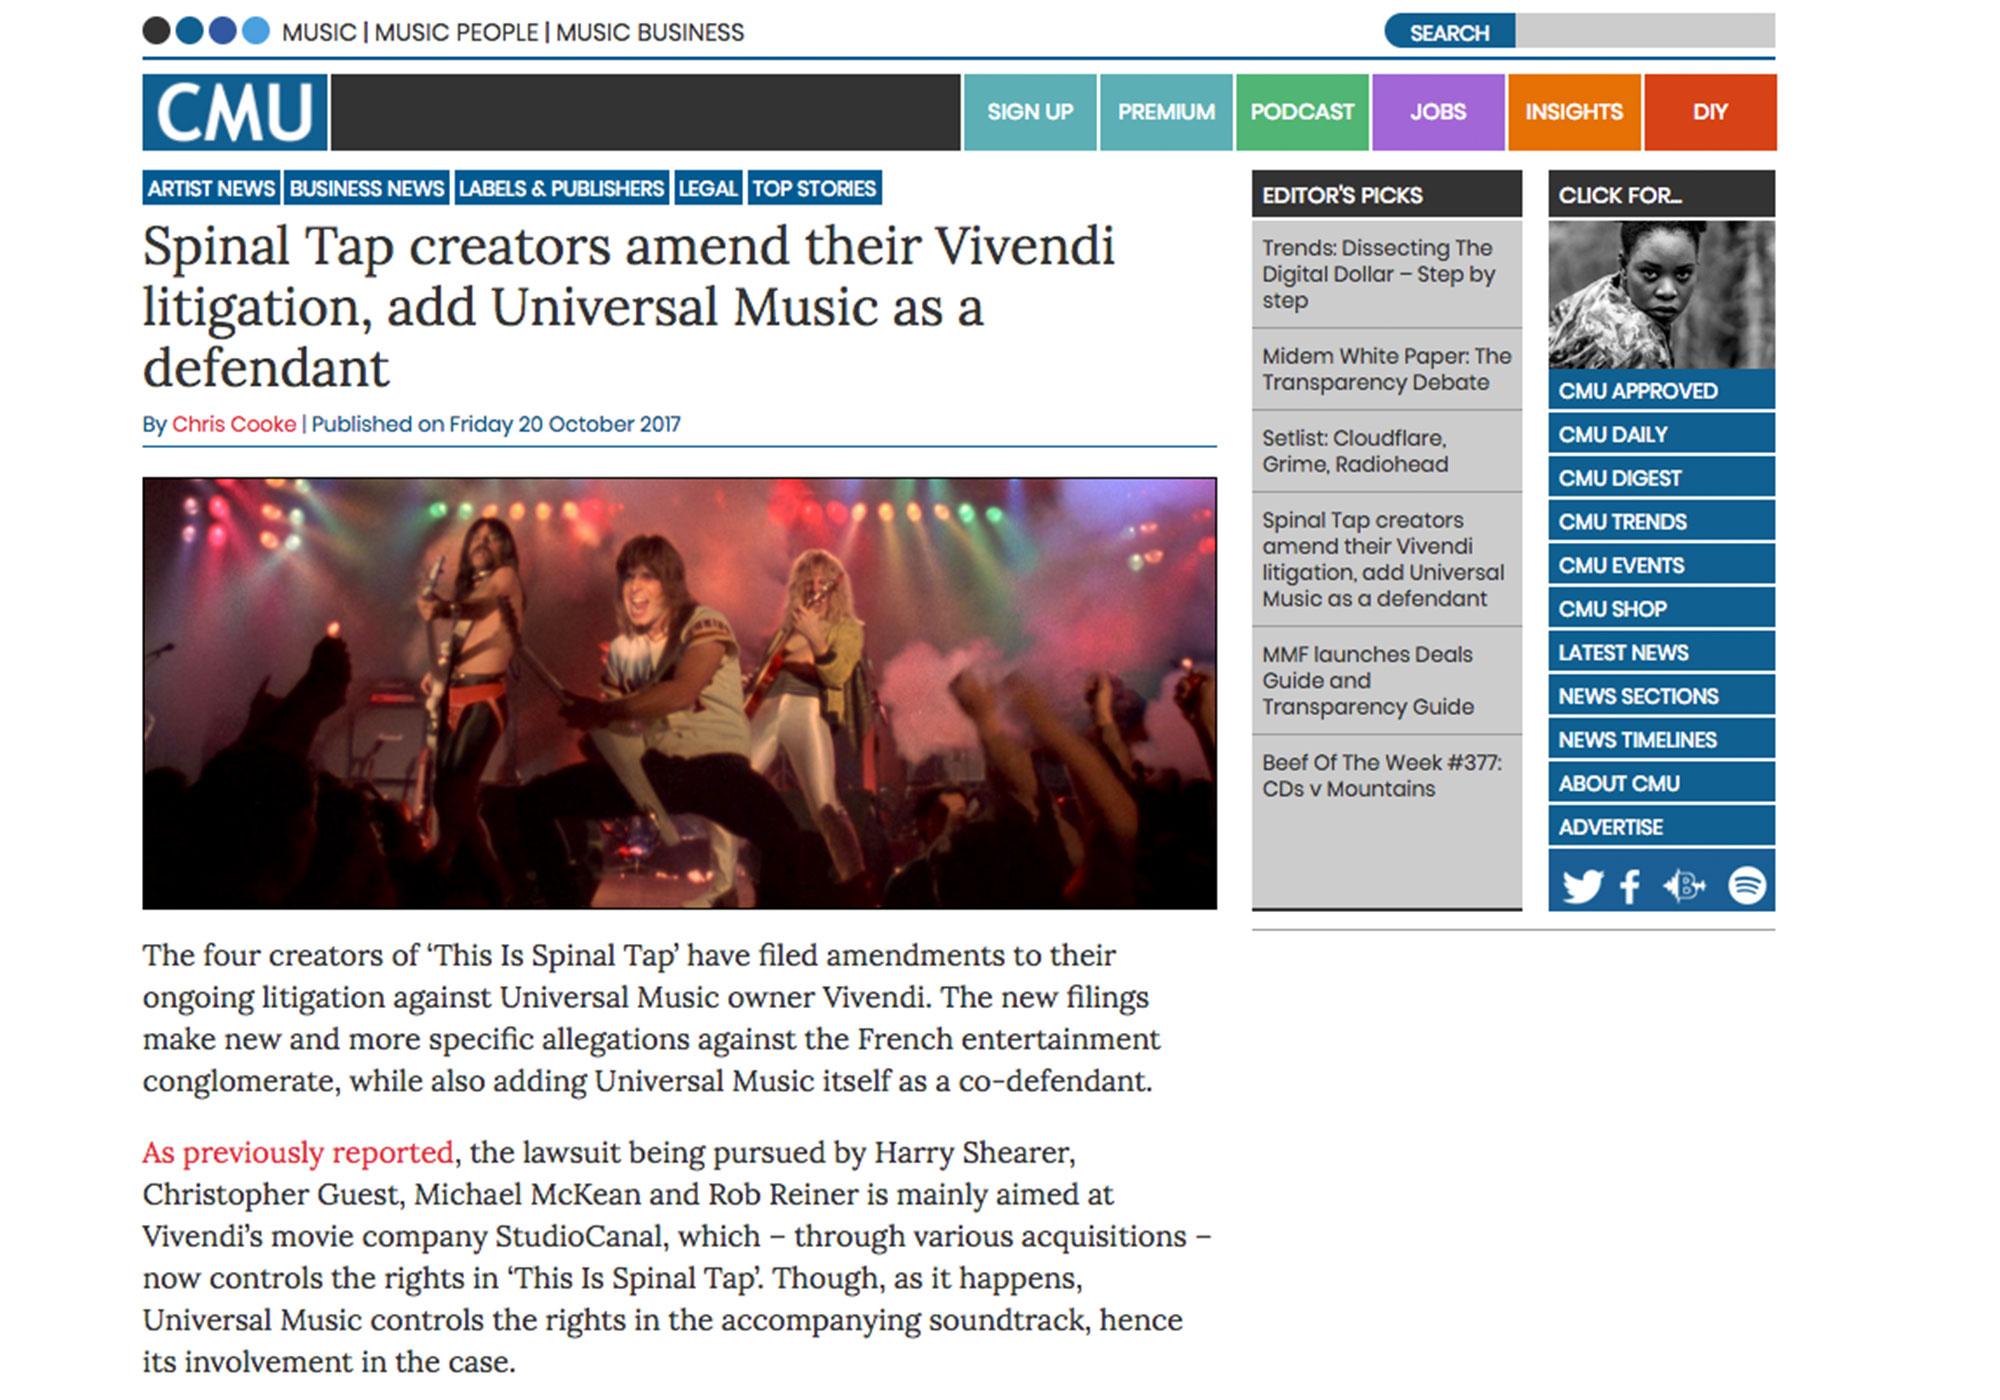 Fairness Rocks News Spinal Tap creators amend their Vivendi litigation, add Universal Music as a defendant